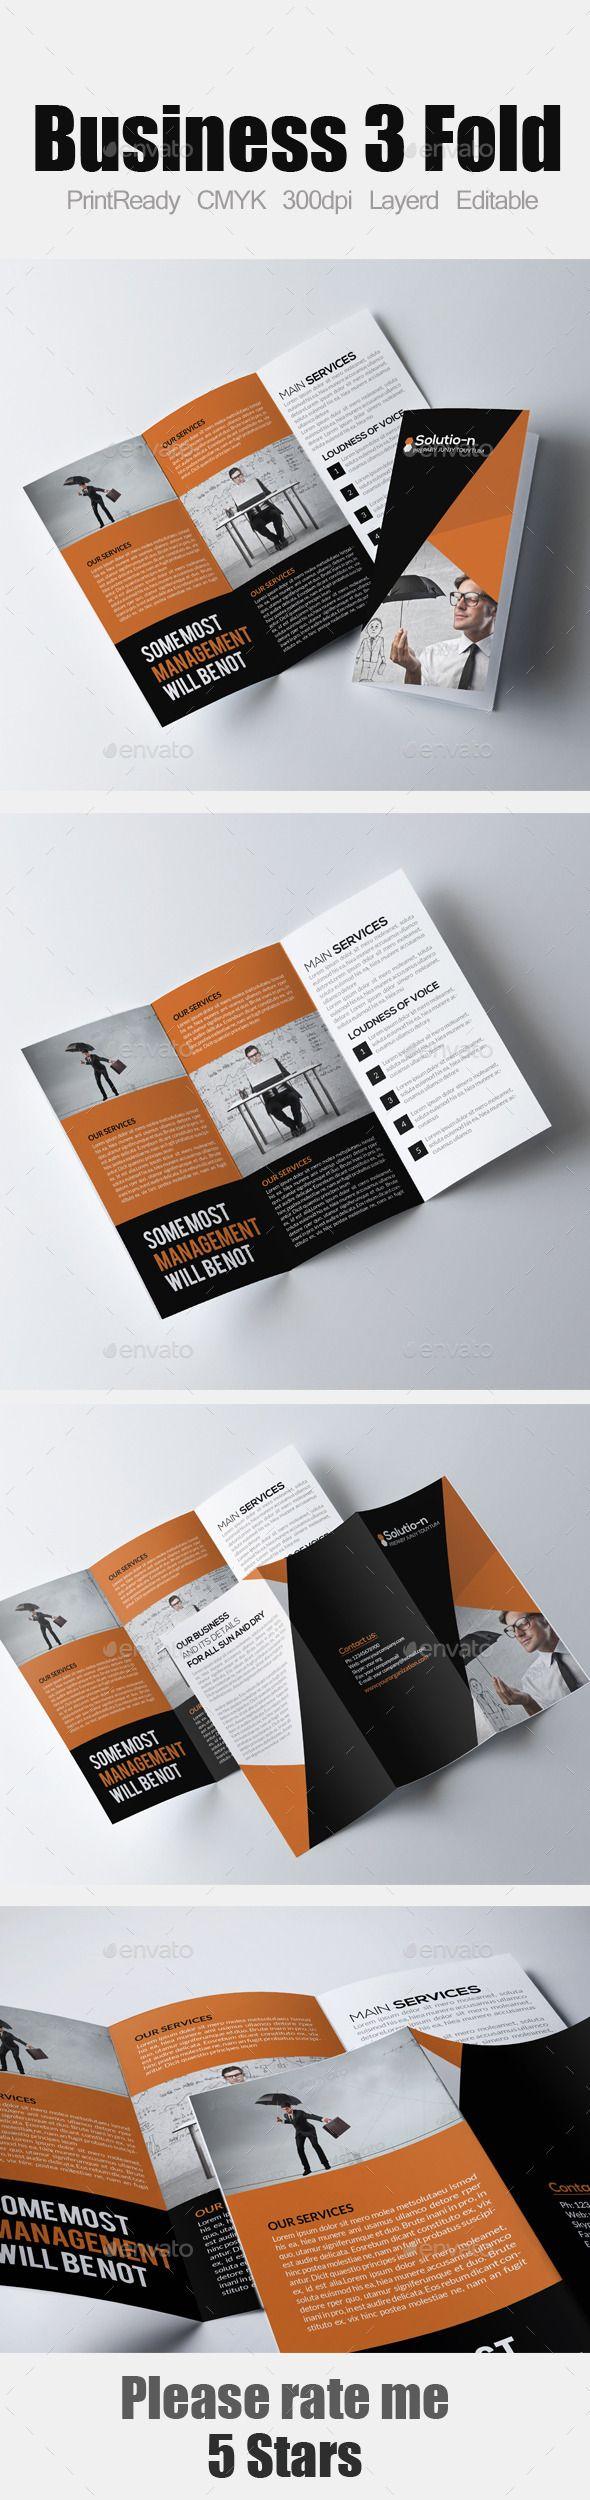 Tri Fold Business Brochure #design Download: http://graphicriver.net/item/tri-fold-business-brochure/12318777?ref=ksioks